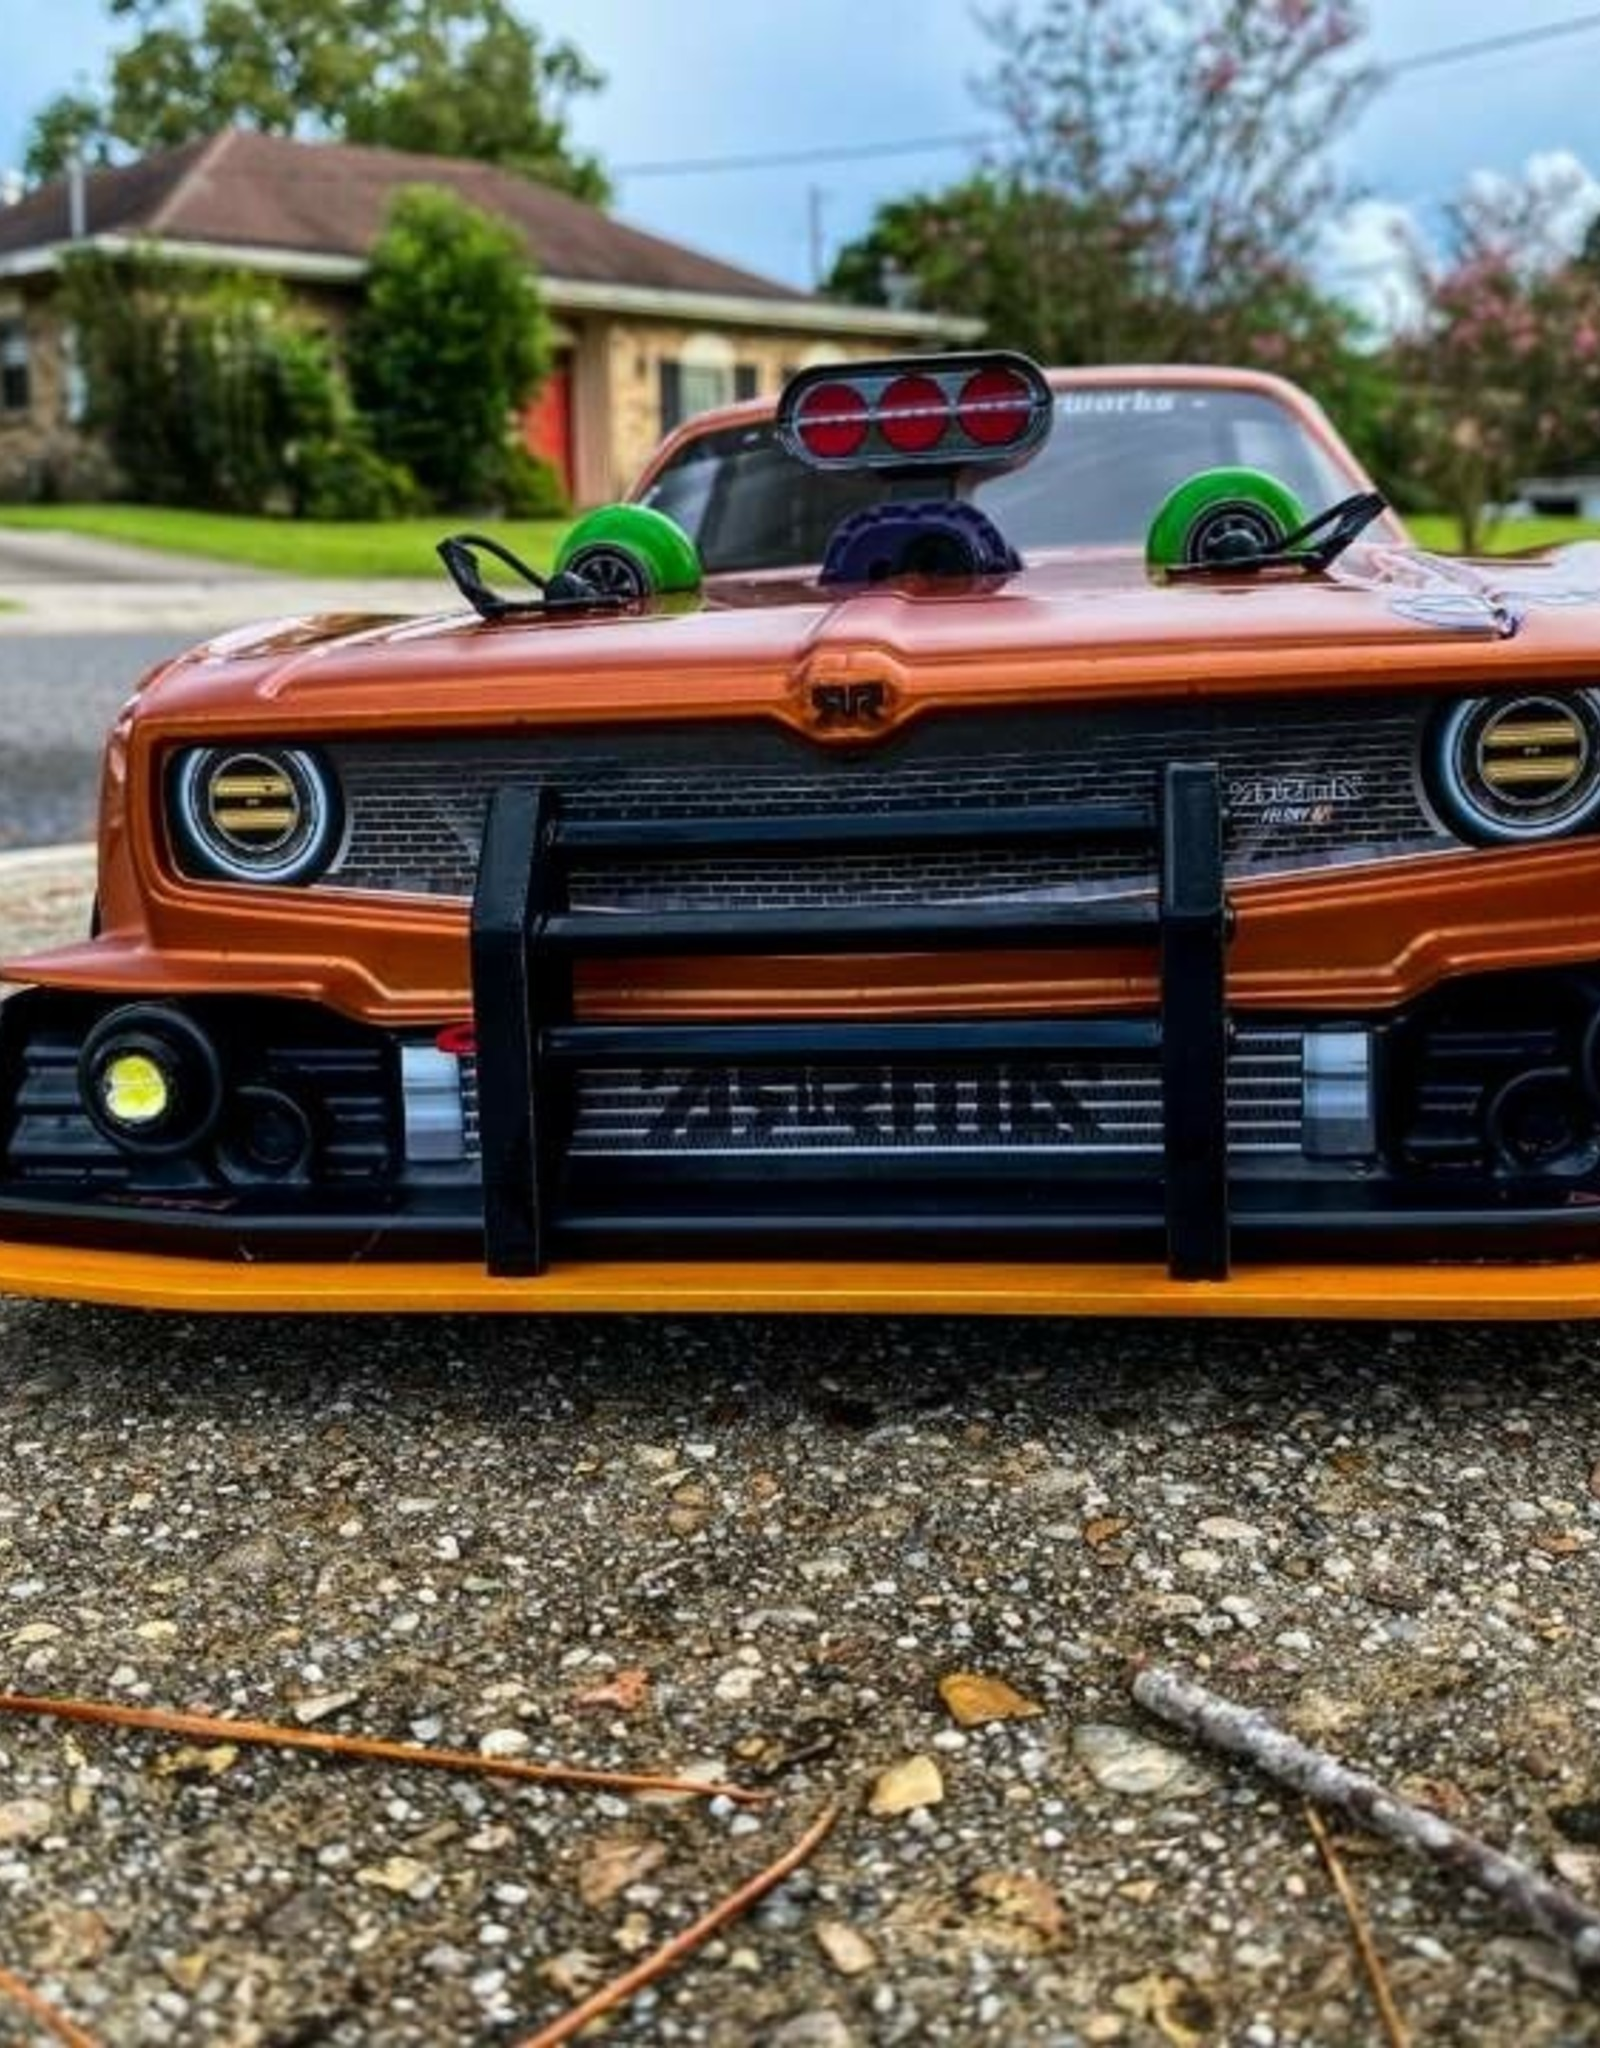 RC Speed Monsters RSM ARRMA Felony Crash Bumper (Orange/Black)